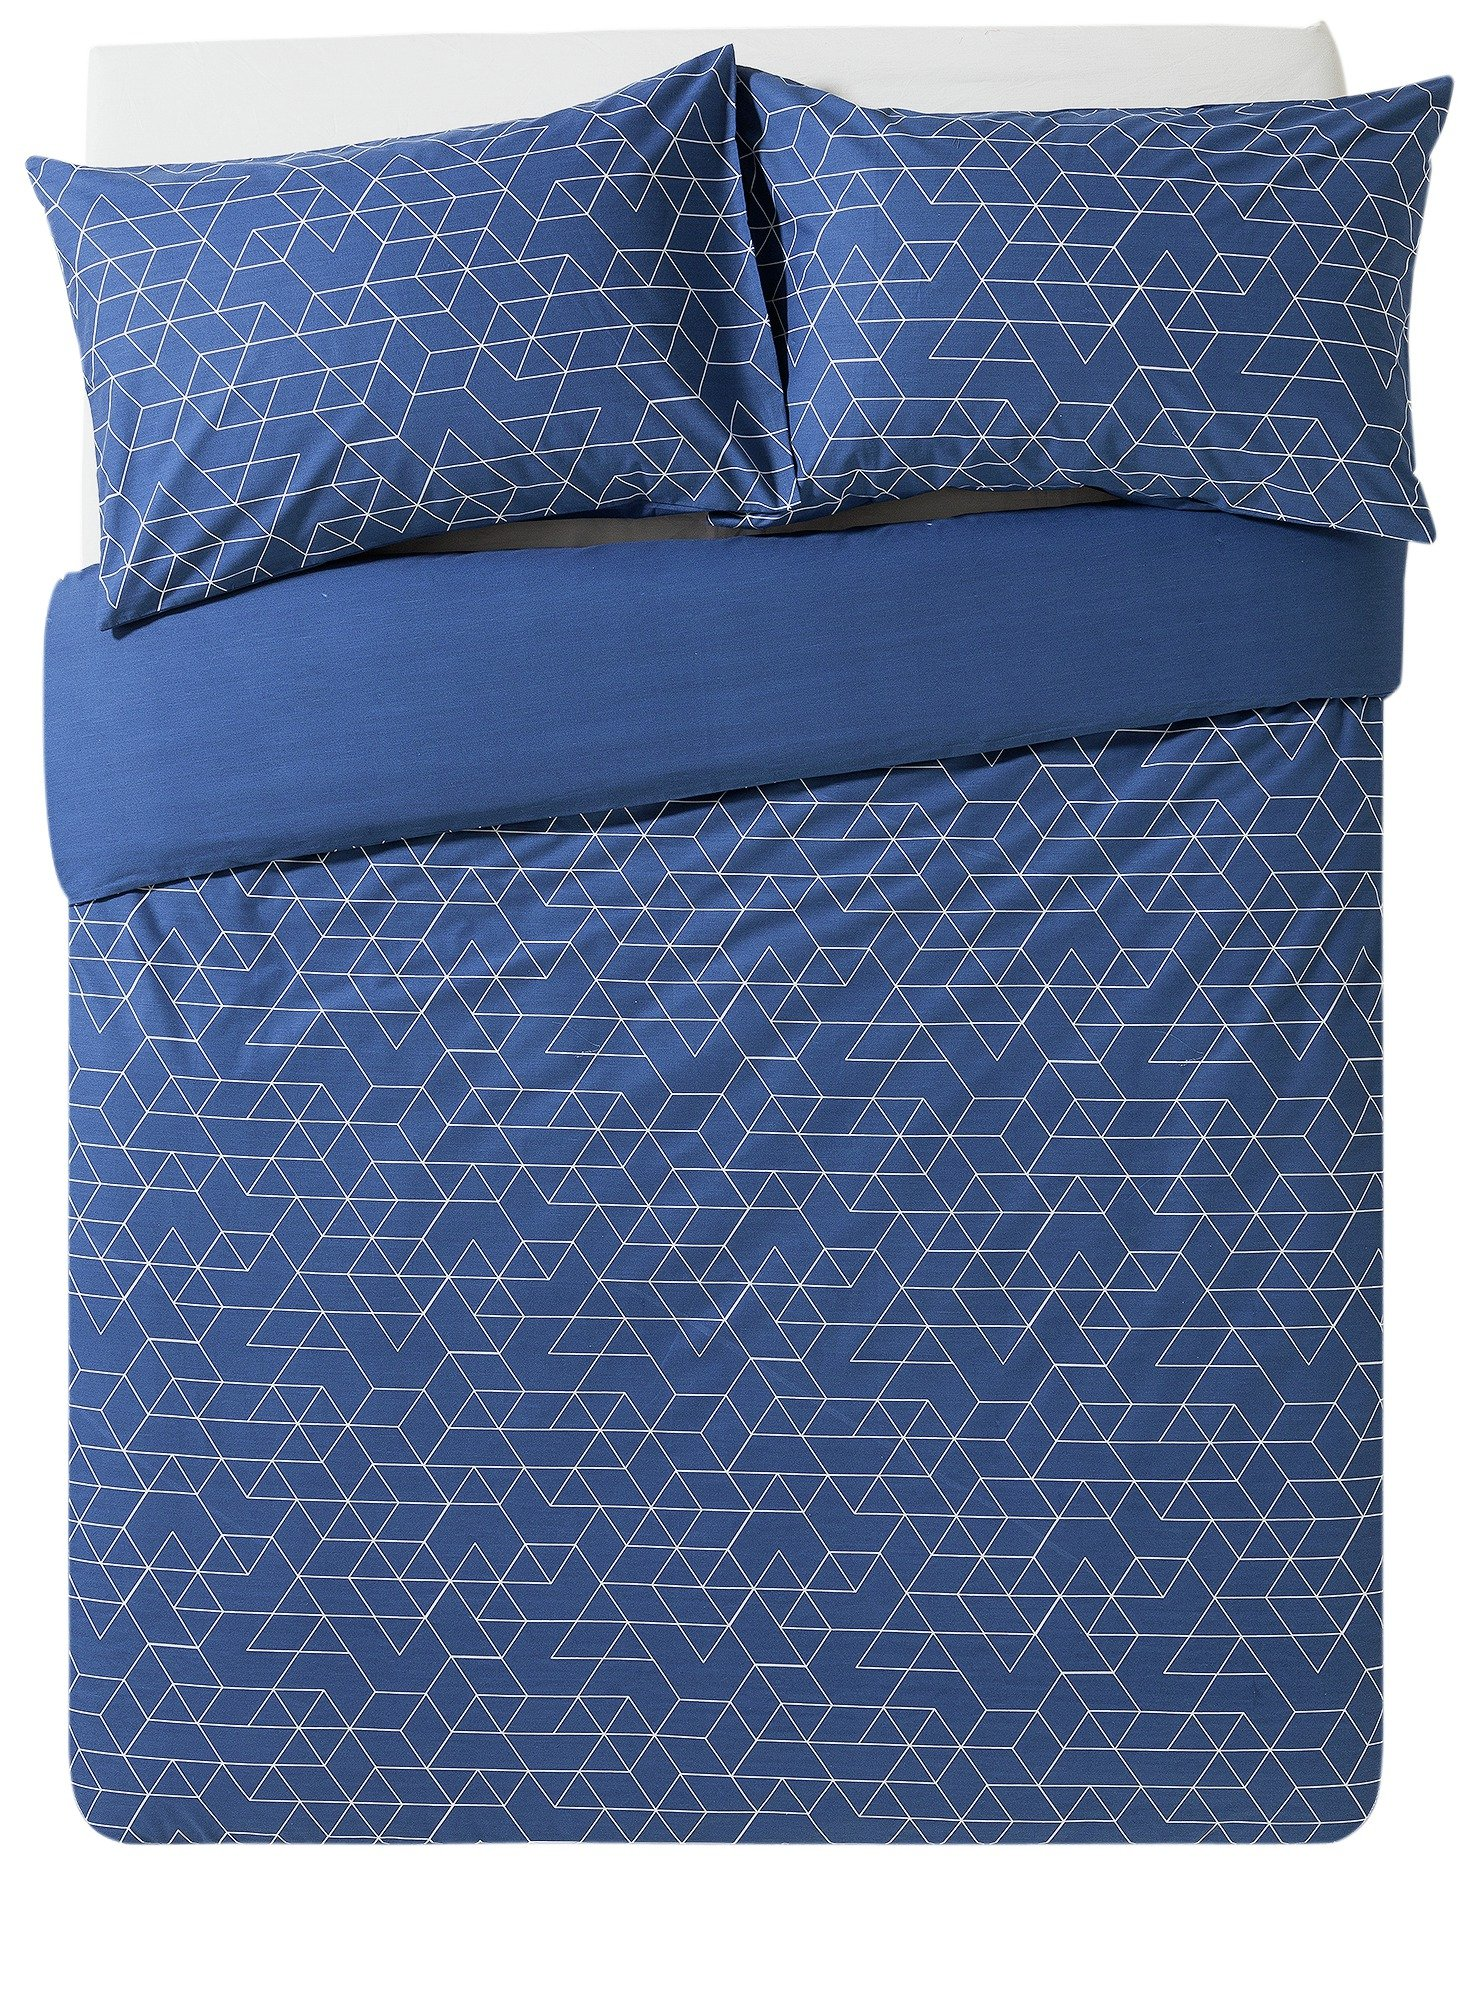 home navy geometric bedding set  kingsize